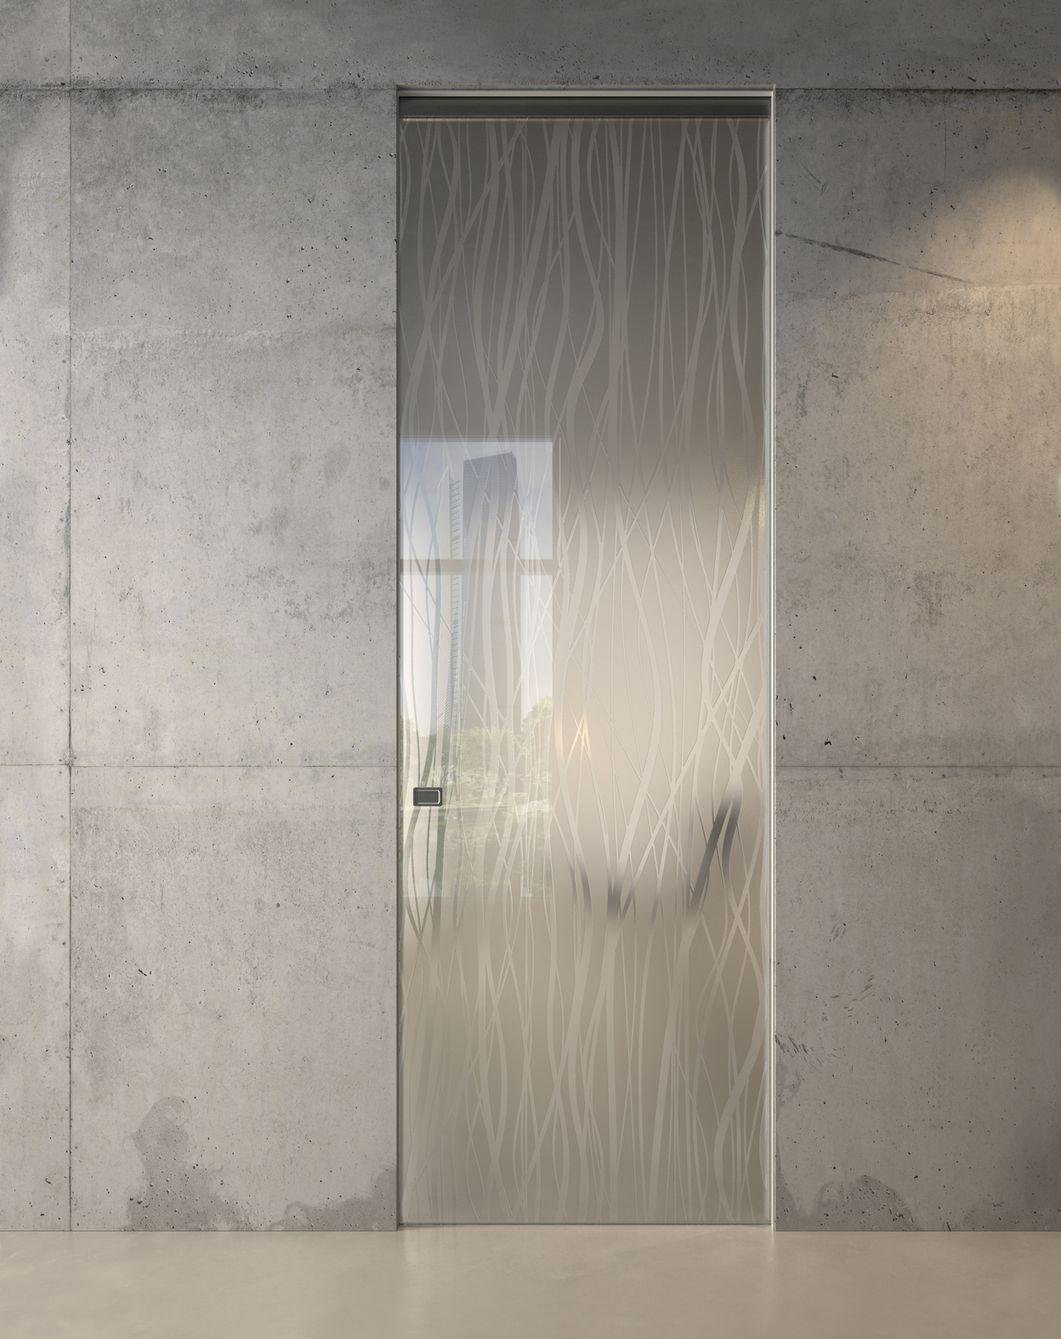 Nussbaum fili madras bianco verticale